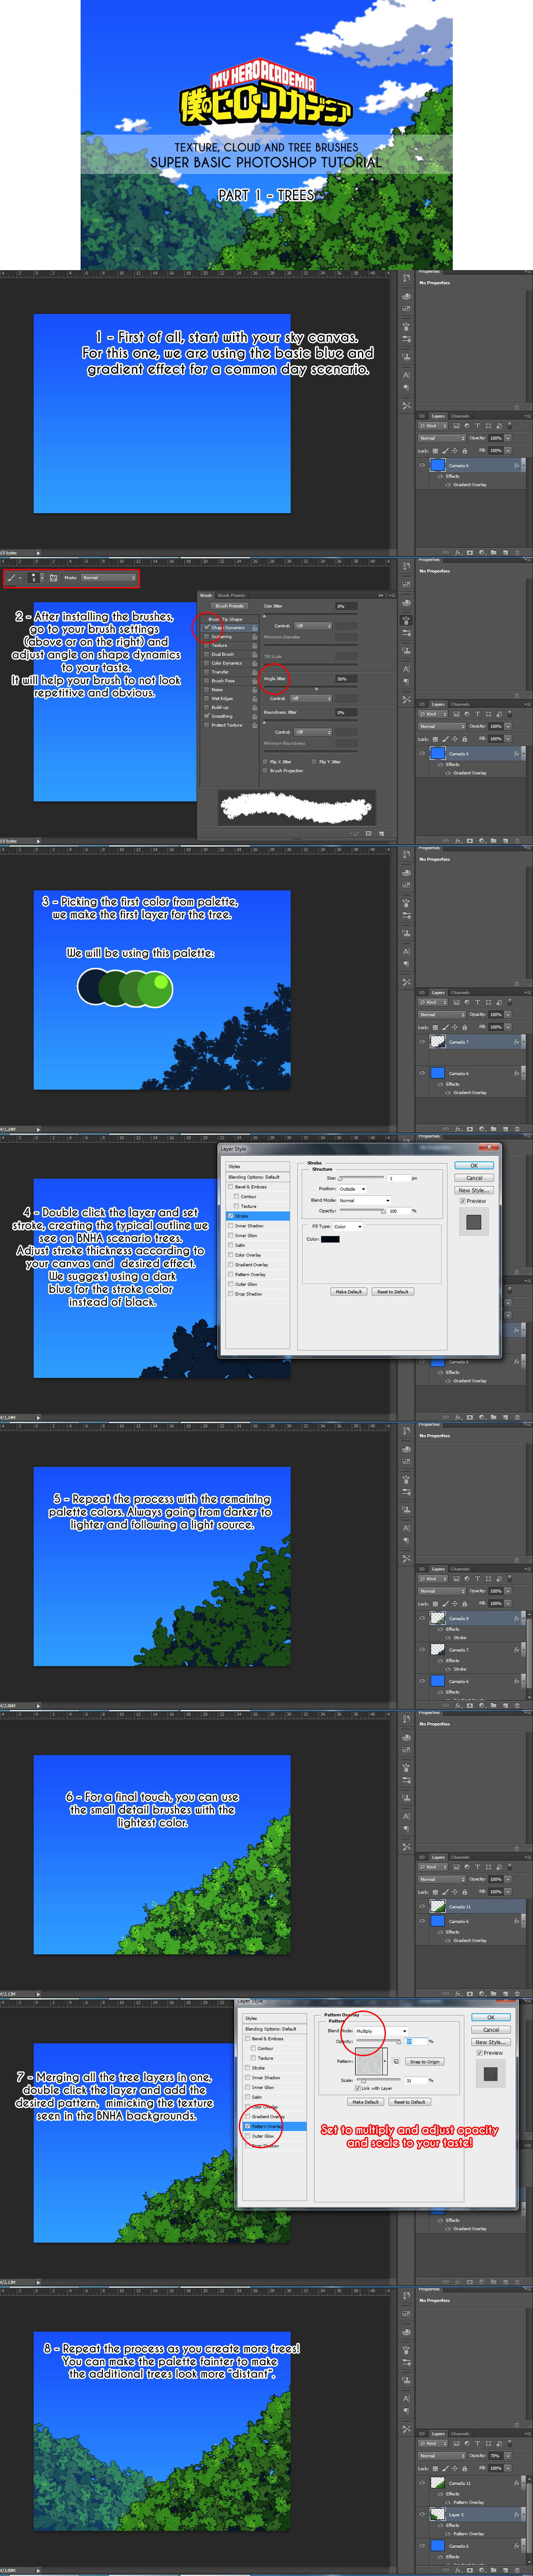 1- BNHA Tree Photoshop brush tutorial + download